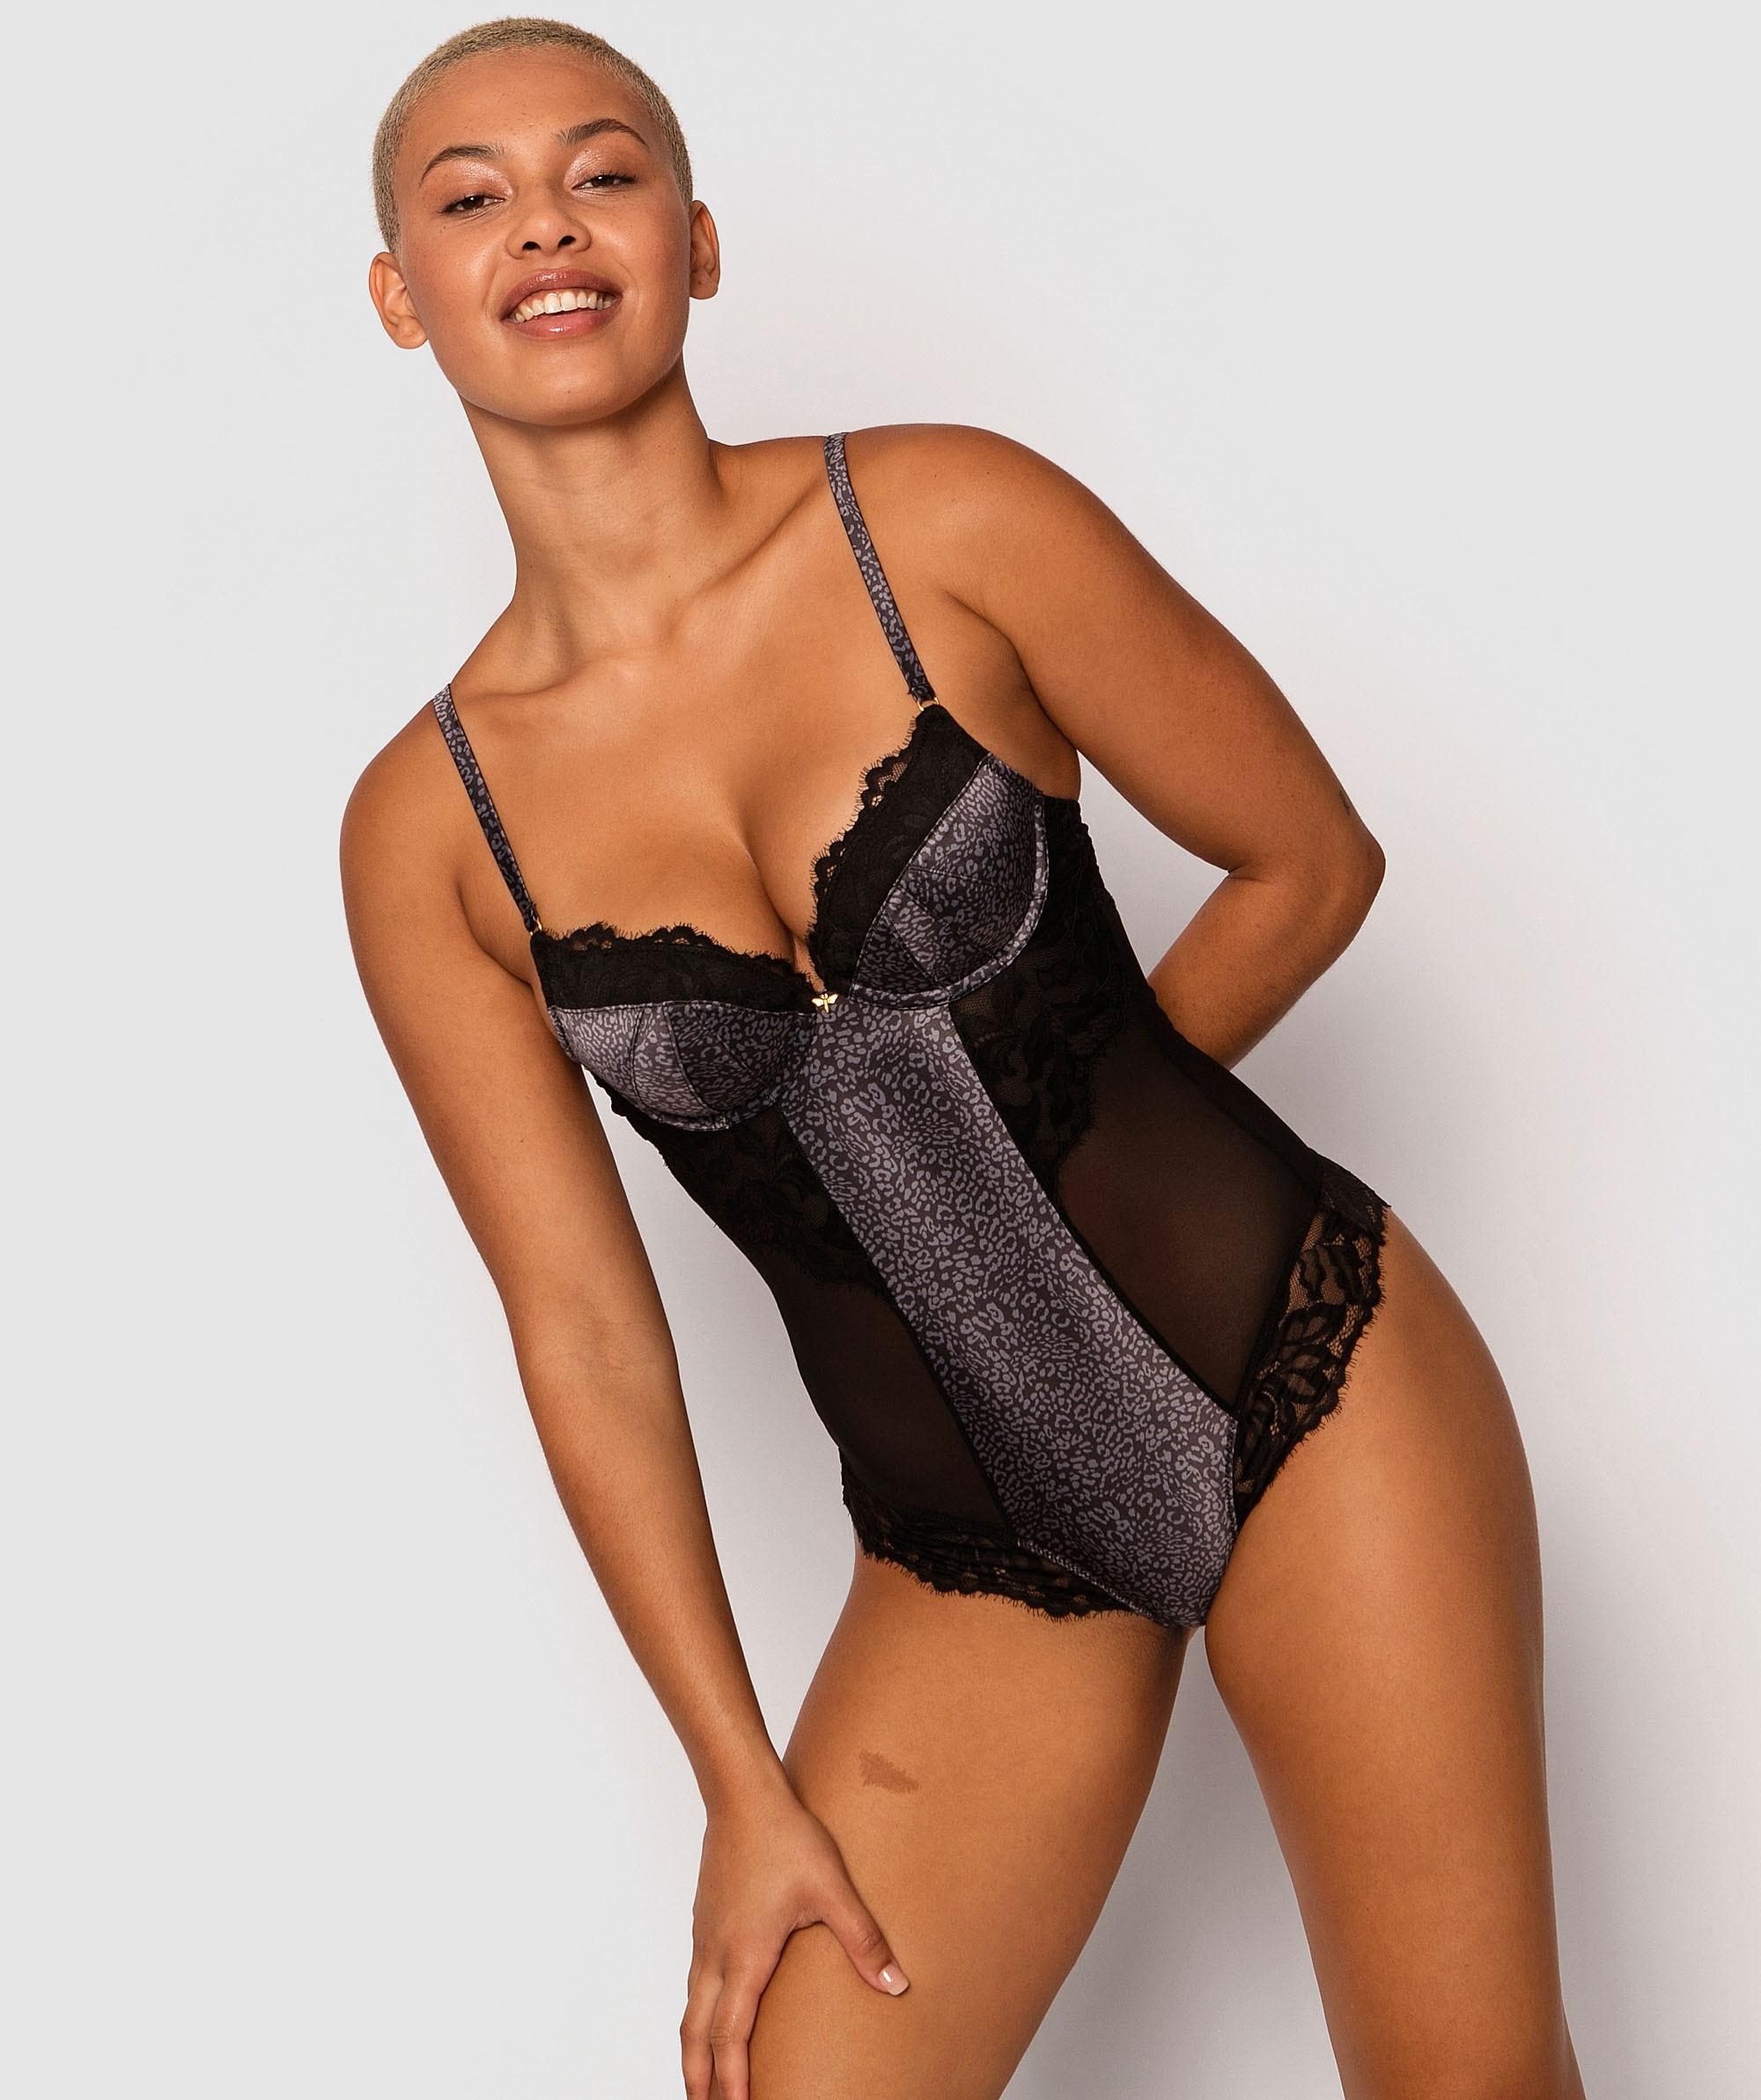 Tropic Glow Contour Bodysuit - Tropical Print/Black